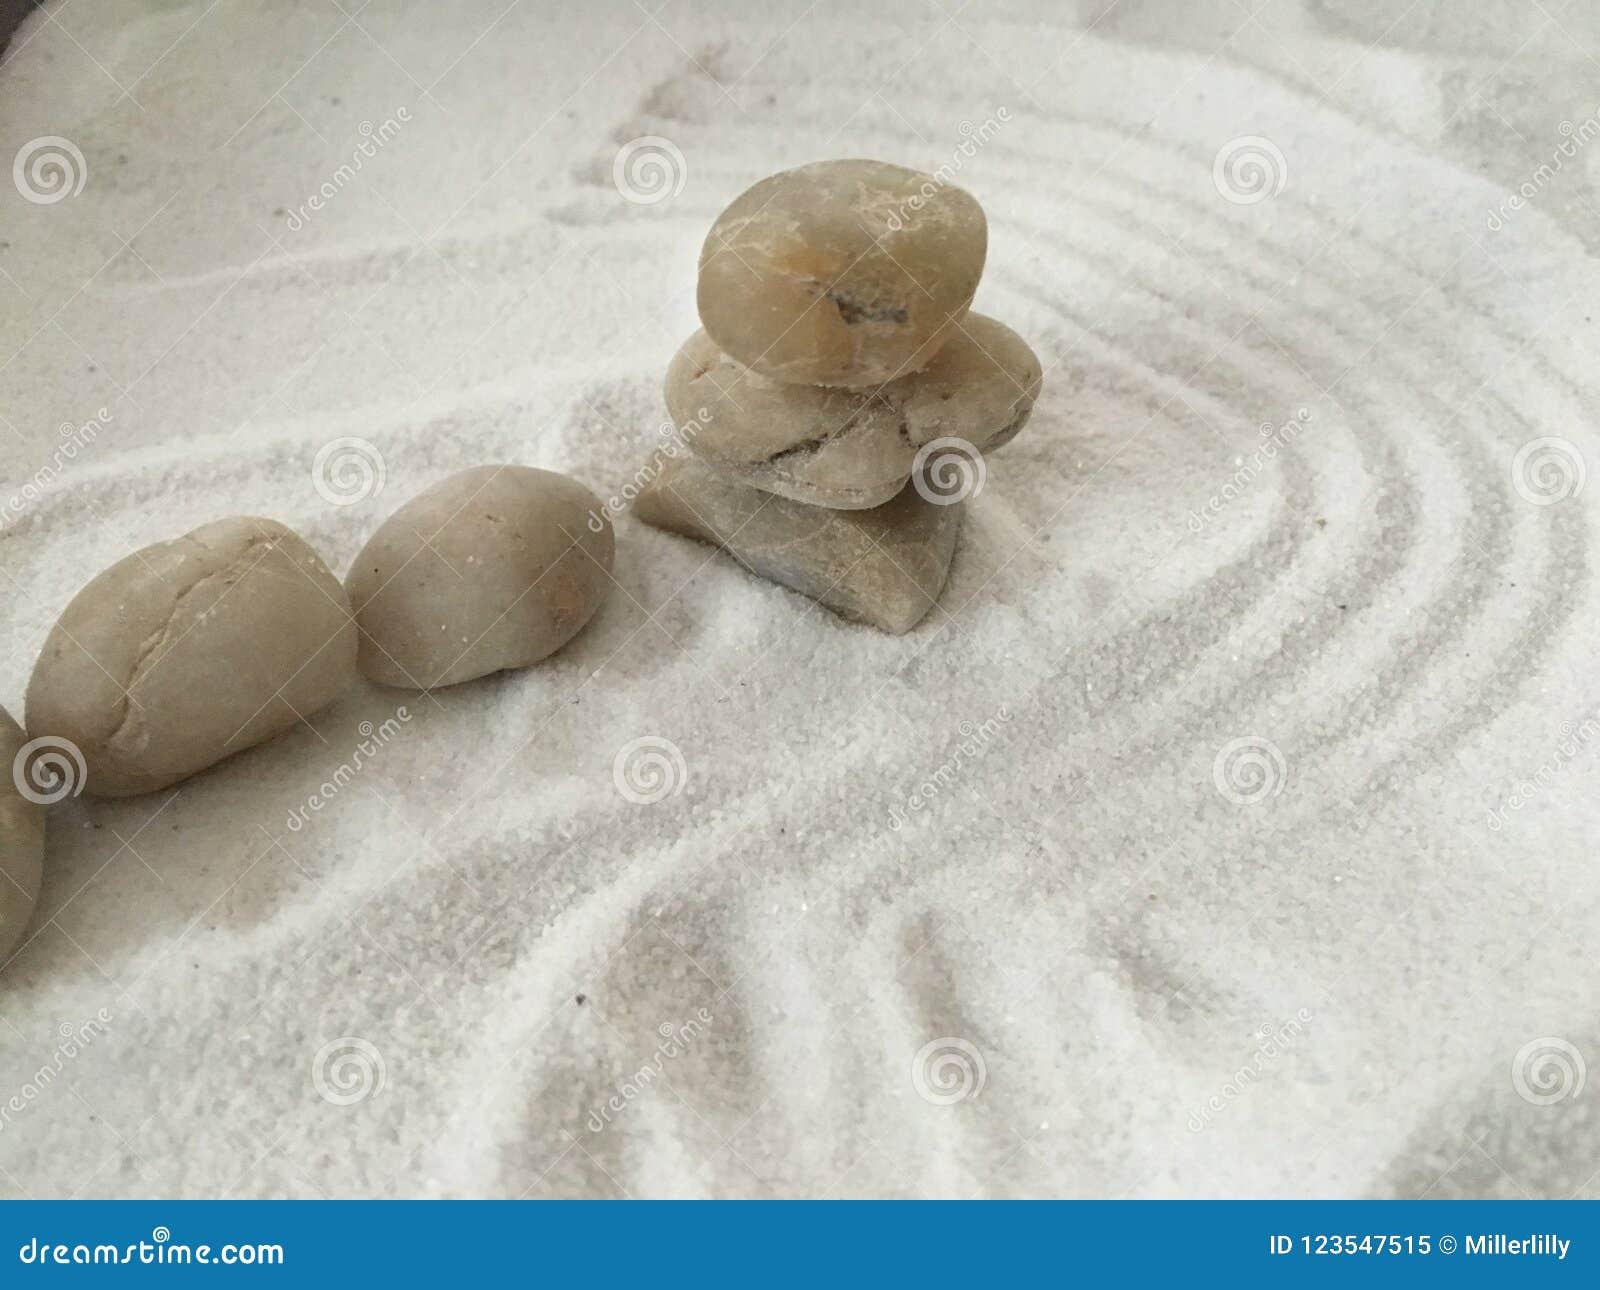 Zen Stones On The Sand Wallpaper Stock Image Image Of